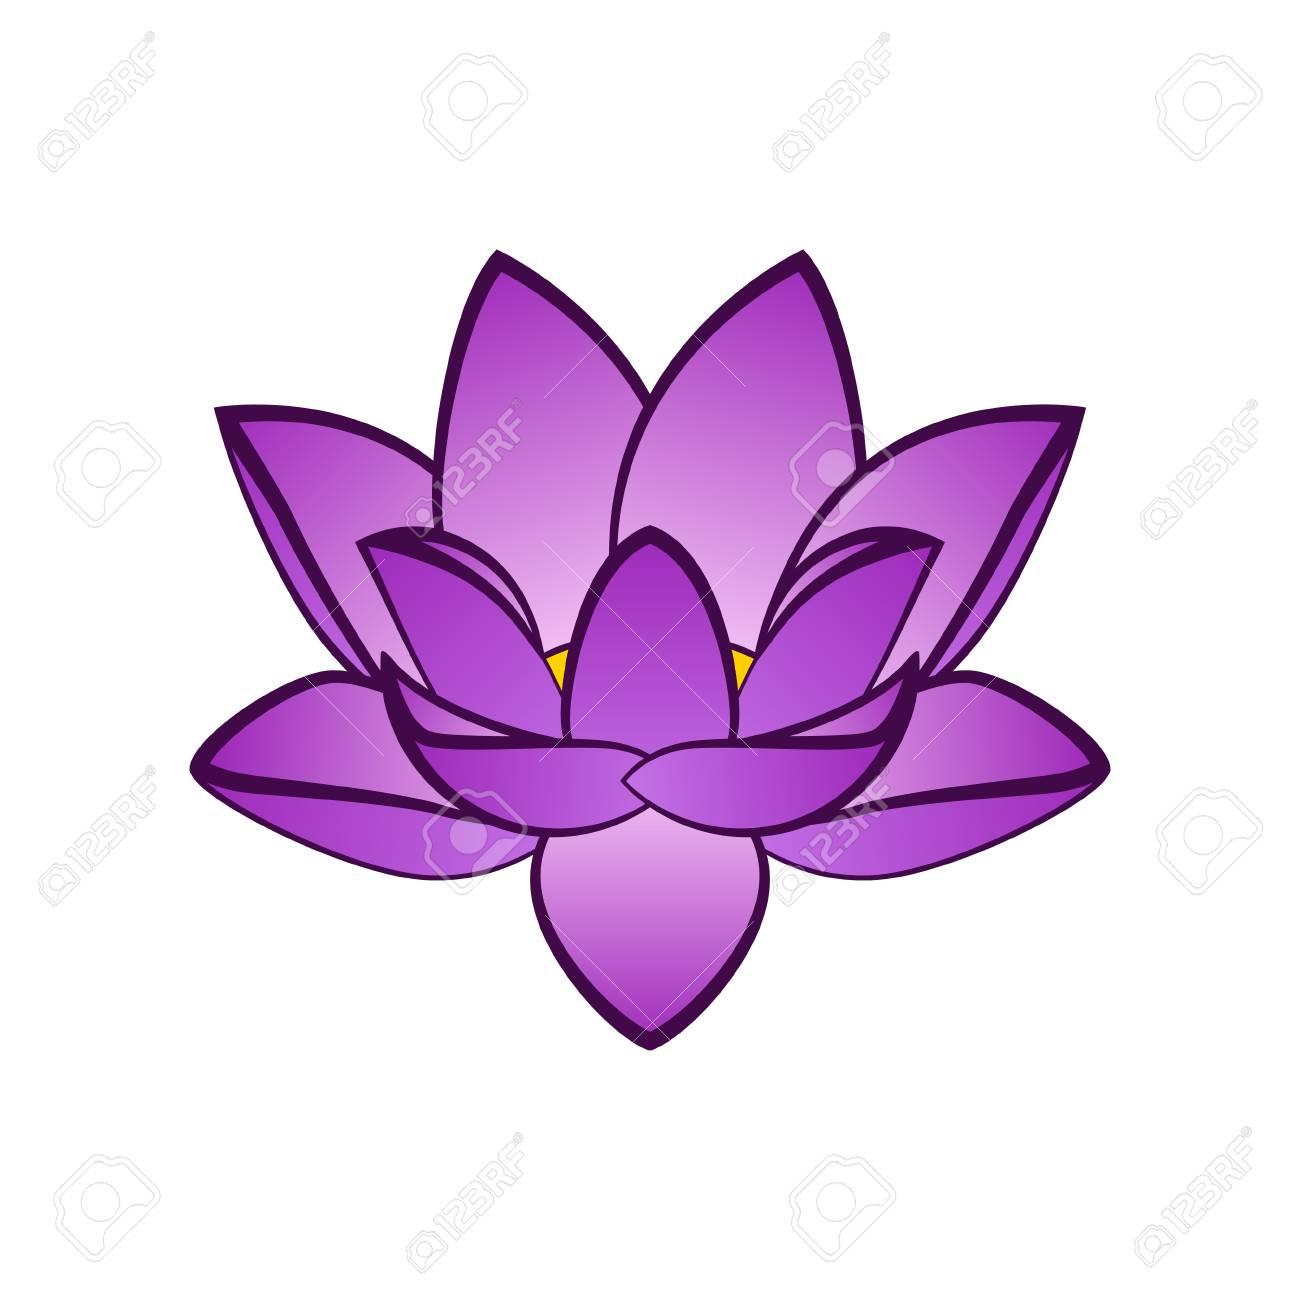 Simple Violet Lotus Flower Vector Illustration Isoleted Aquatic